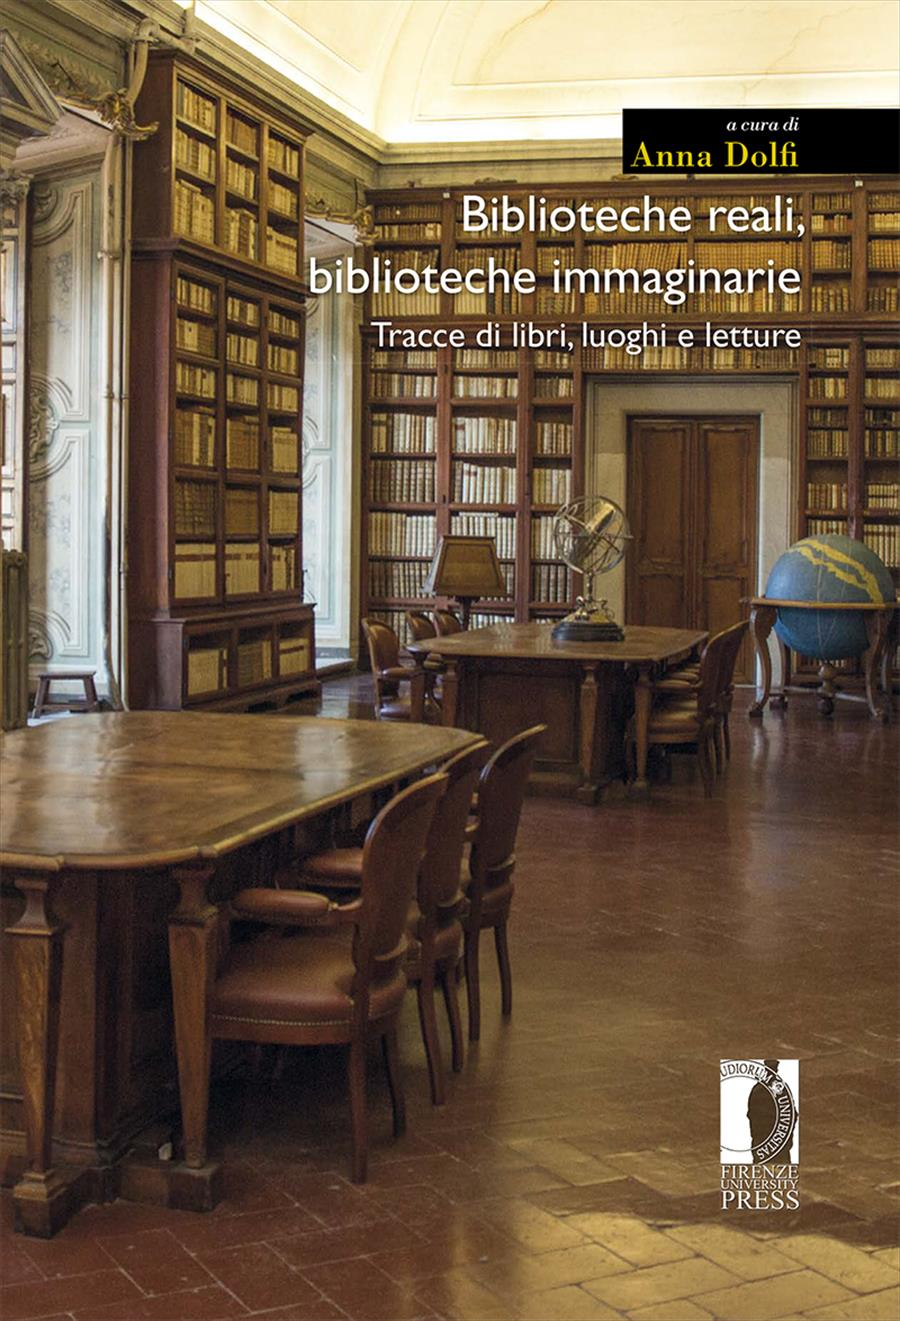 Biblioteche reali, biblioteche immaginarie